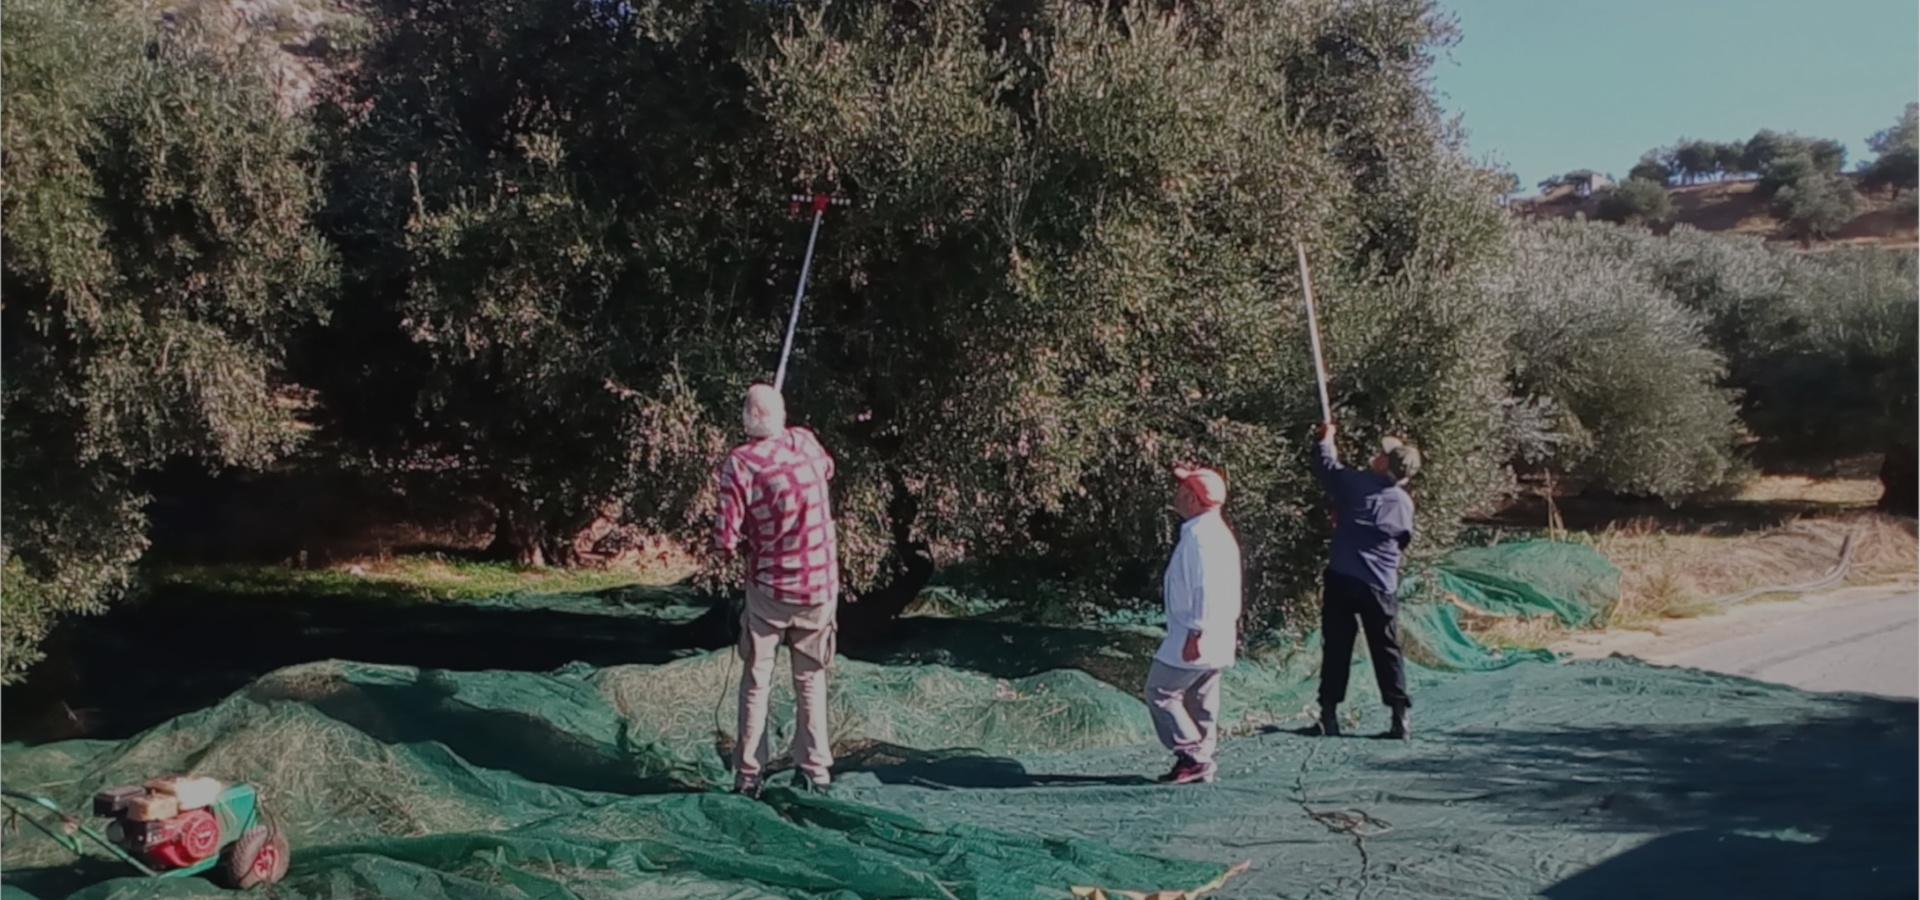 People Harvesting an olive tree